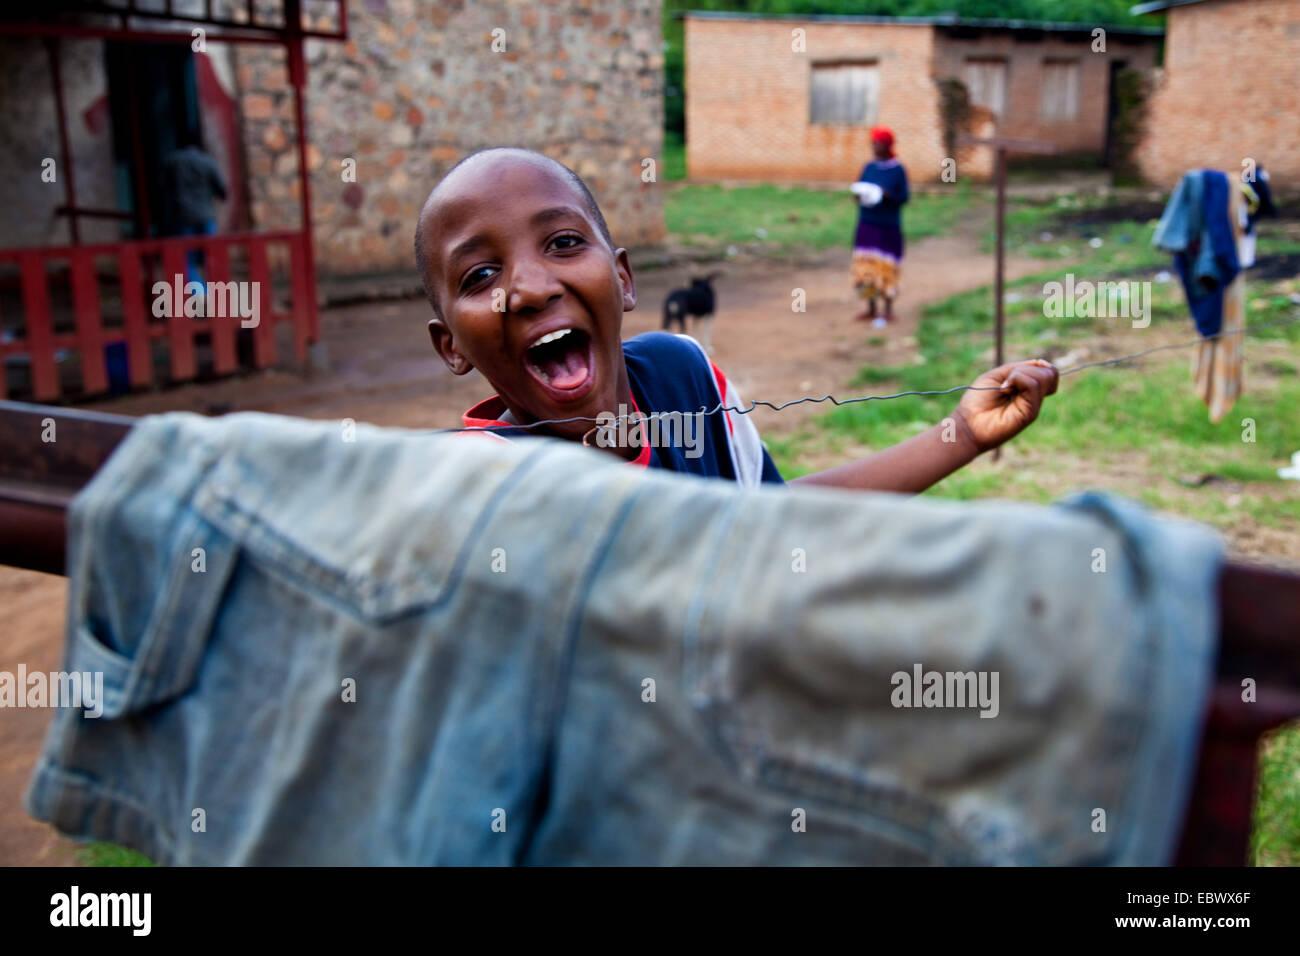 boy in a courtyard looking over a clothesline laughing, Burundi, Bujumbura Marie, Bujumbura - Stock Image